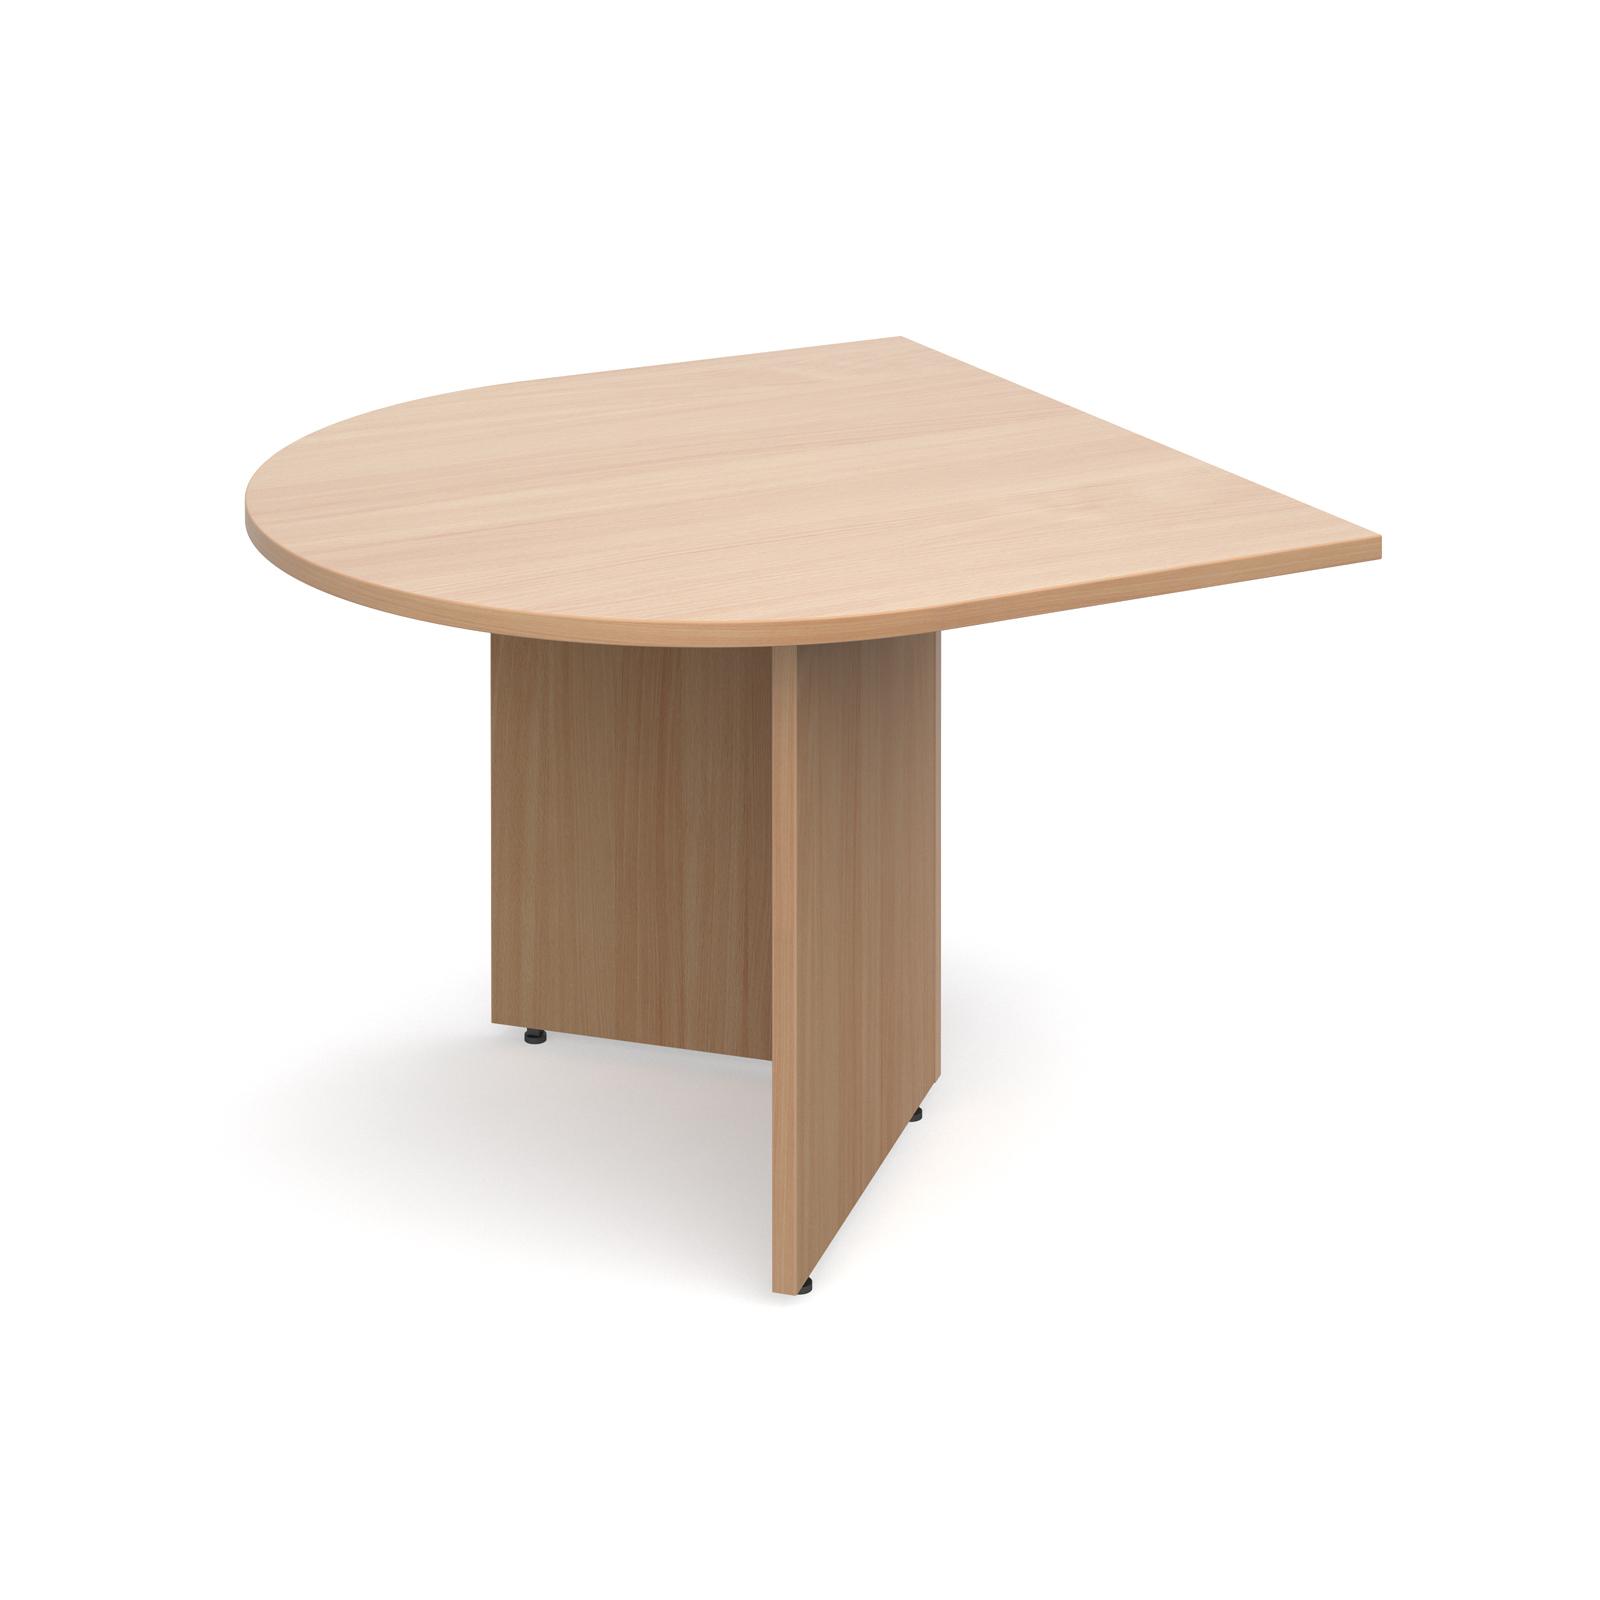 Arrow head leg radial extension table